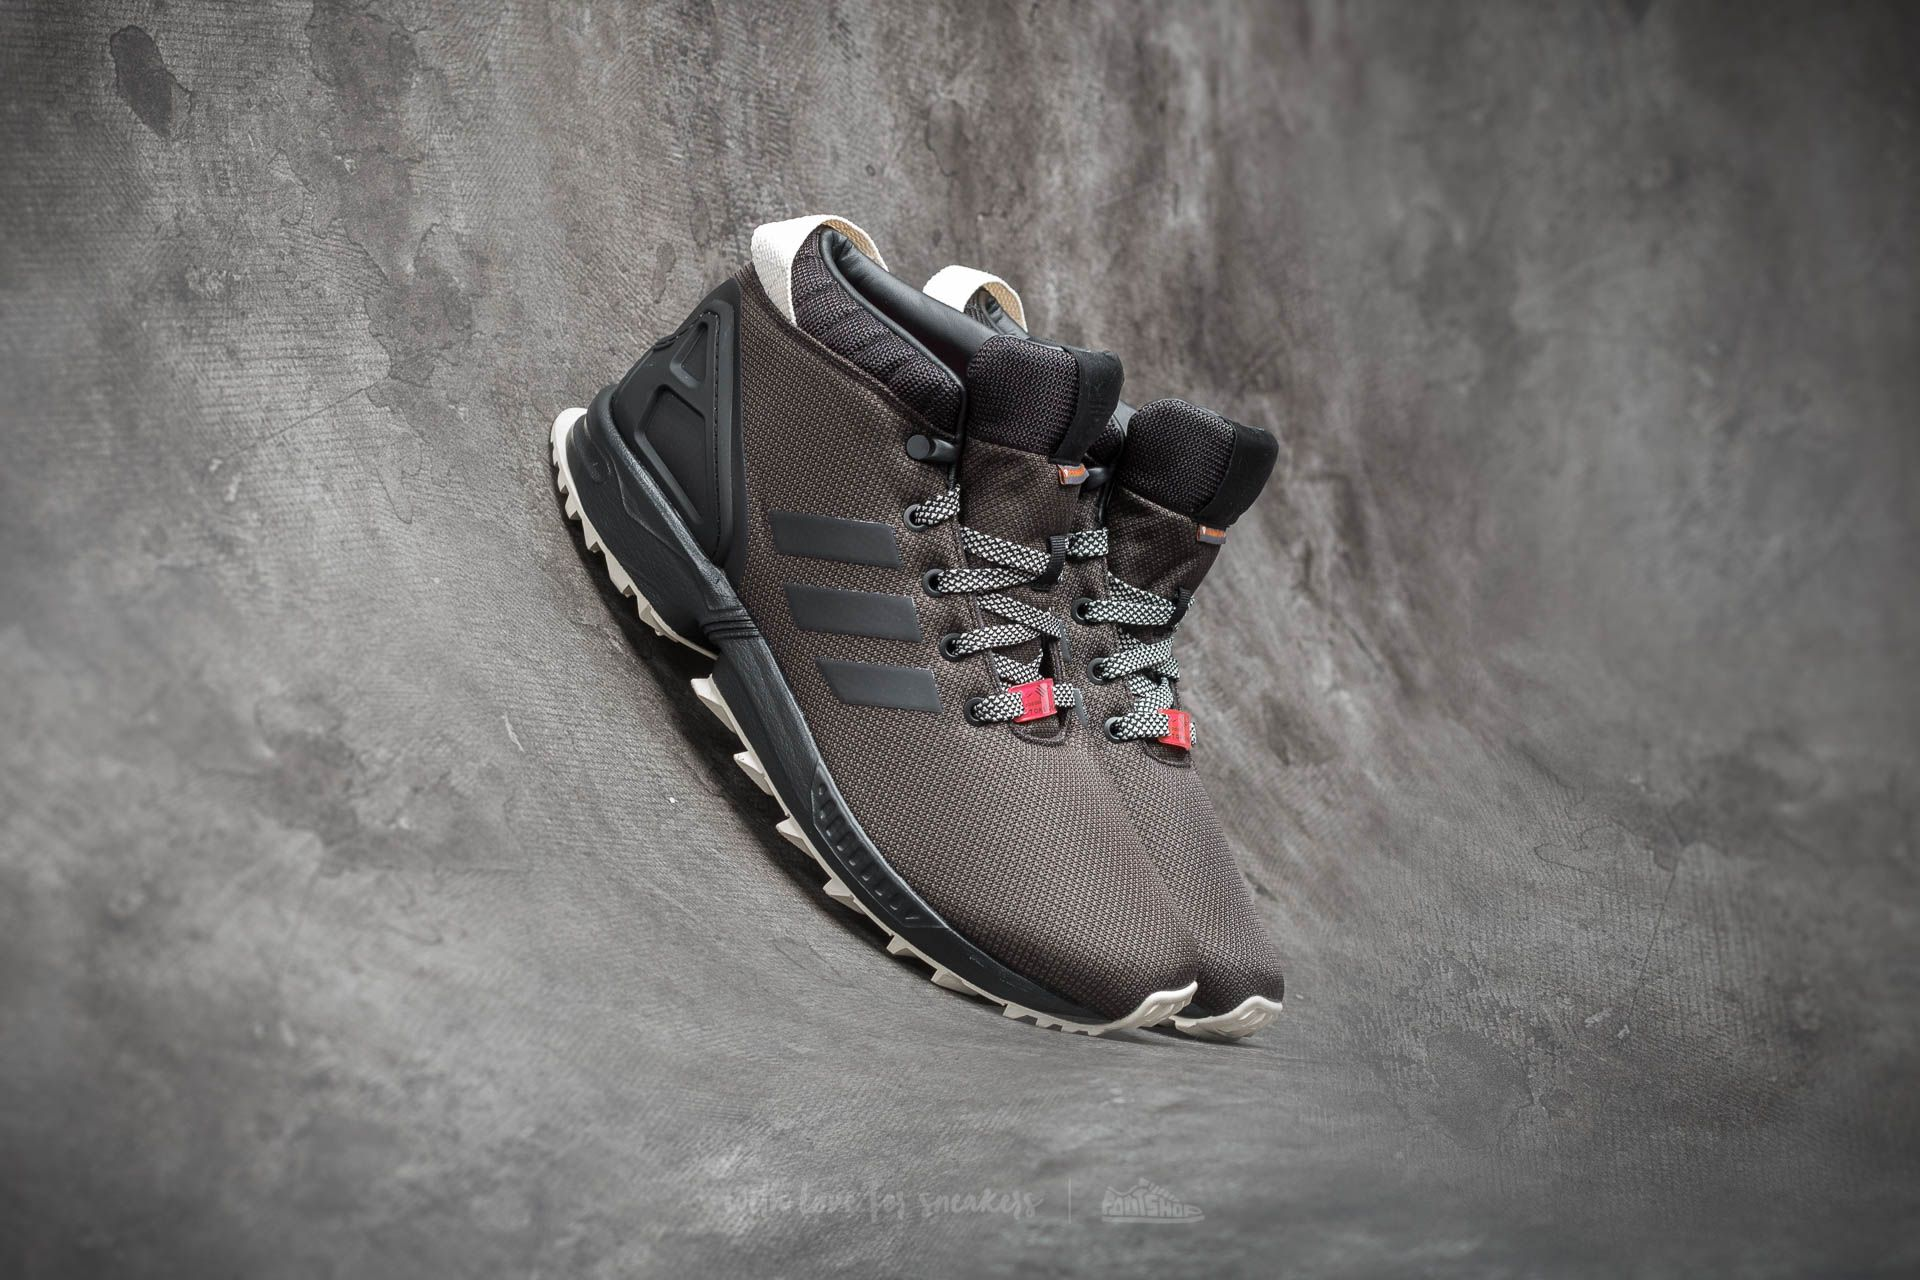 b0485470b0e2a adidas Zx Flux 5  8 Trainers Core Black  Utility Black  Core White ...